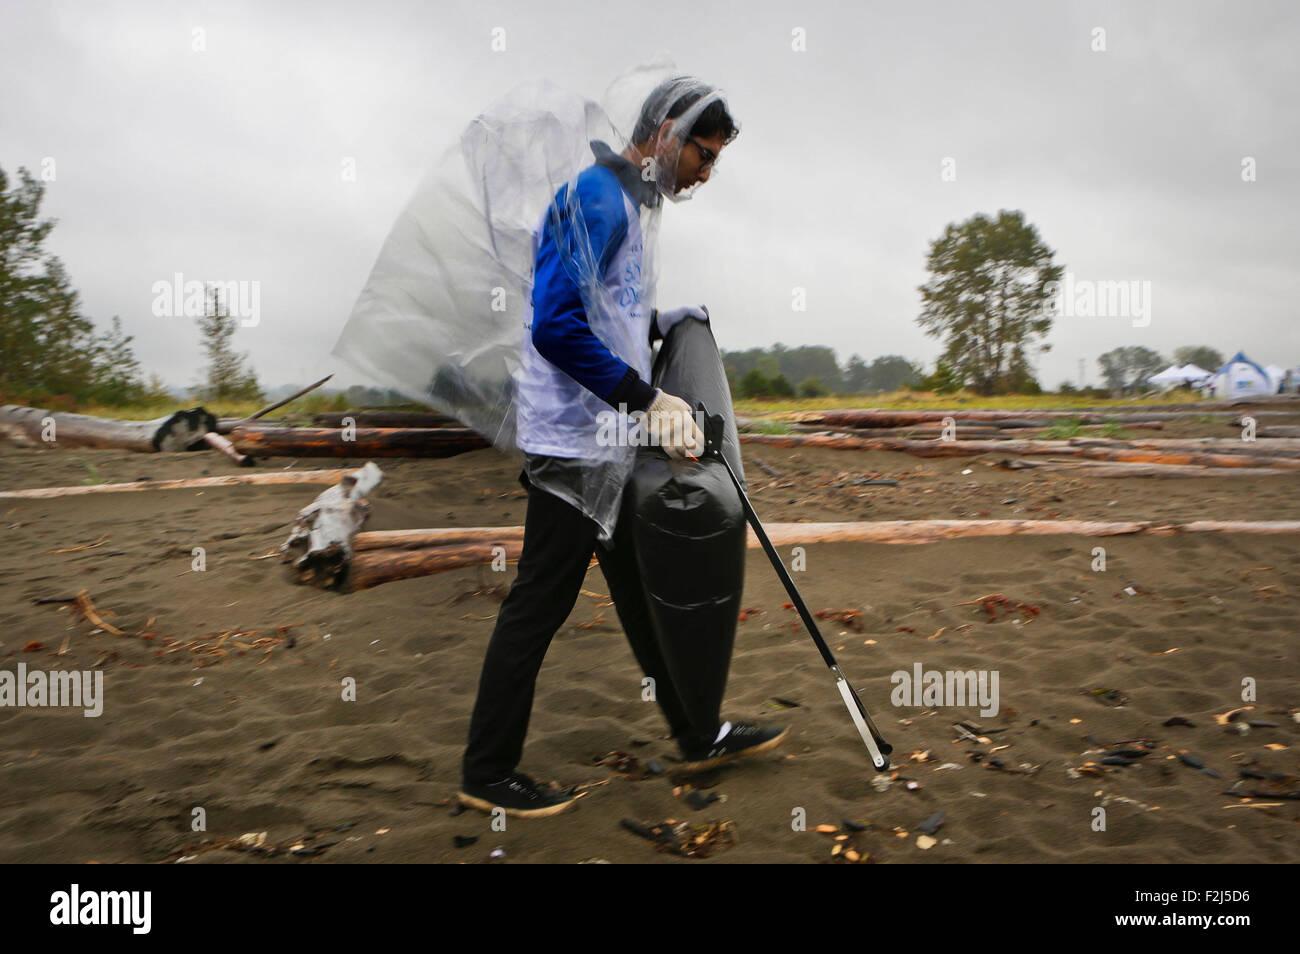 Vancouver, Canada. 19th Sep, 2015. A participant in rain coat collect debris at Iona Beach in Richmond, Canada, - Stock Image